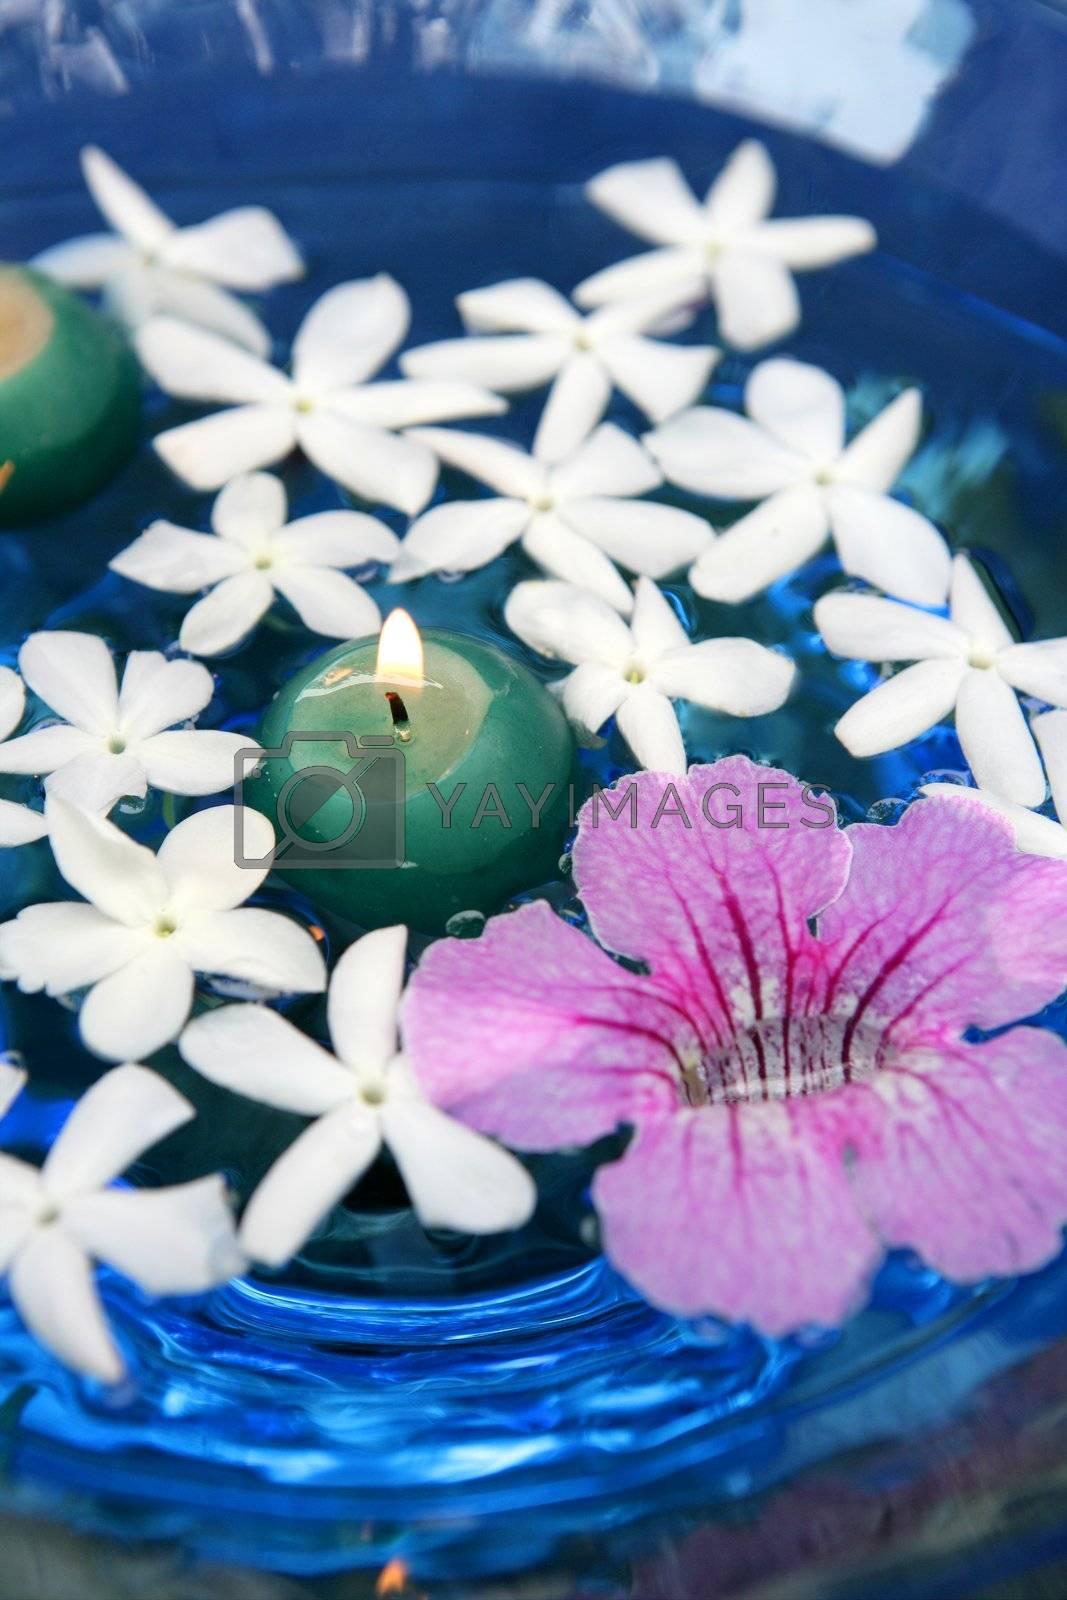 Royalty free image of Jasmine, and pink Asarina, candles and blue water by lunamarina